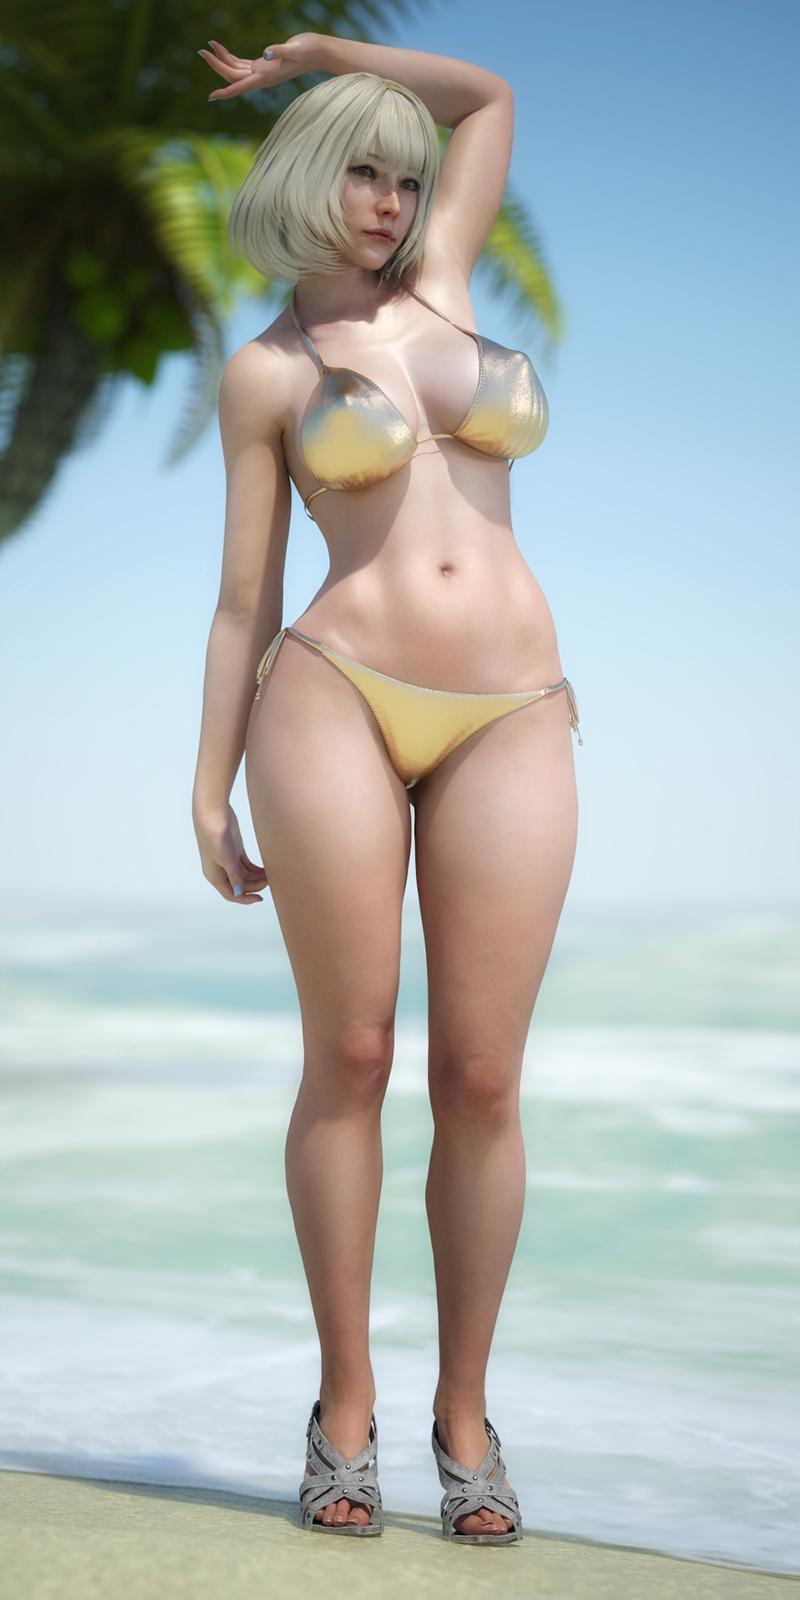 Bikini Babes Xxx